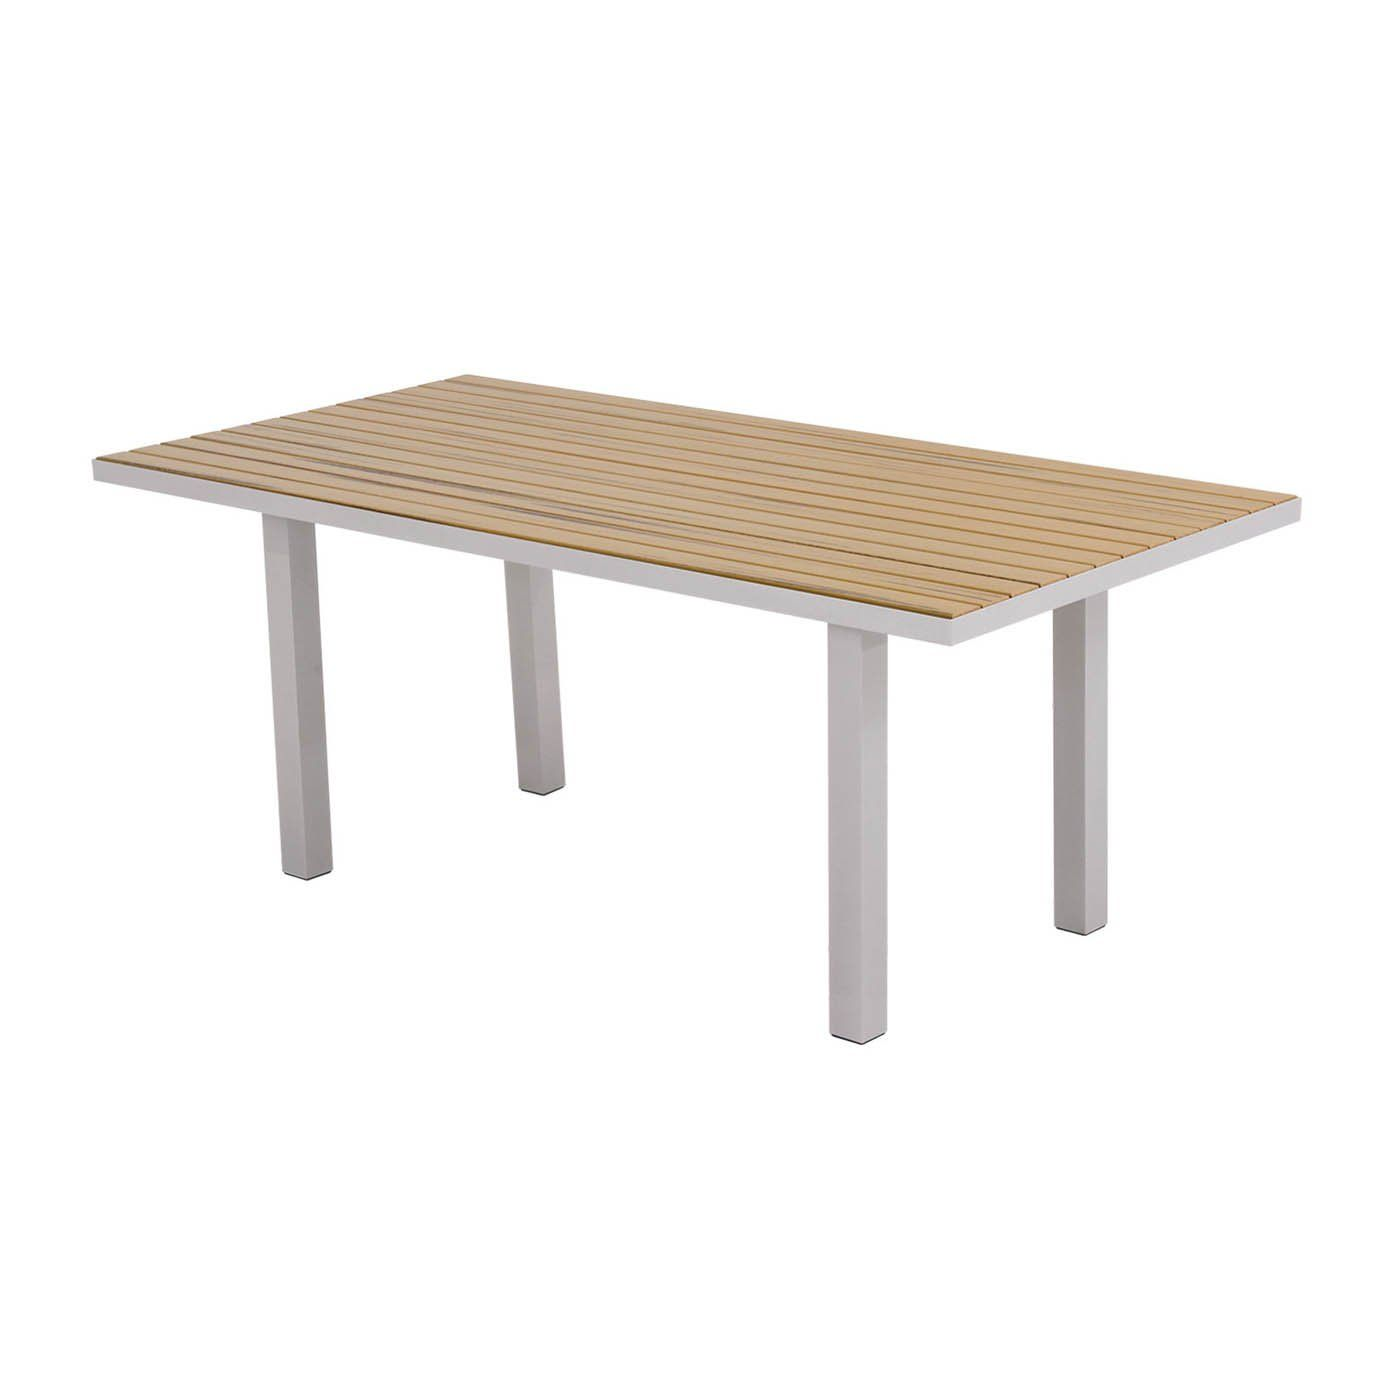 POLYWOOD® AT3672 Euro Rectangular Outdoor Dining Table